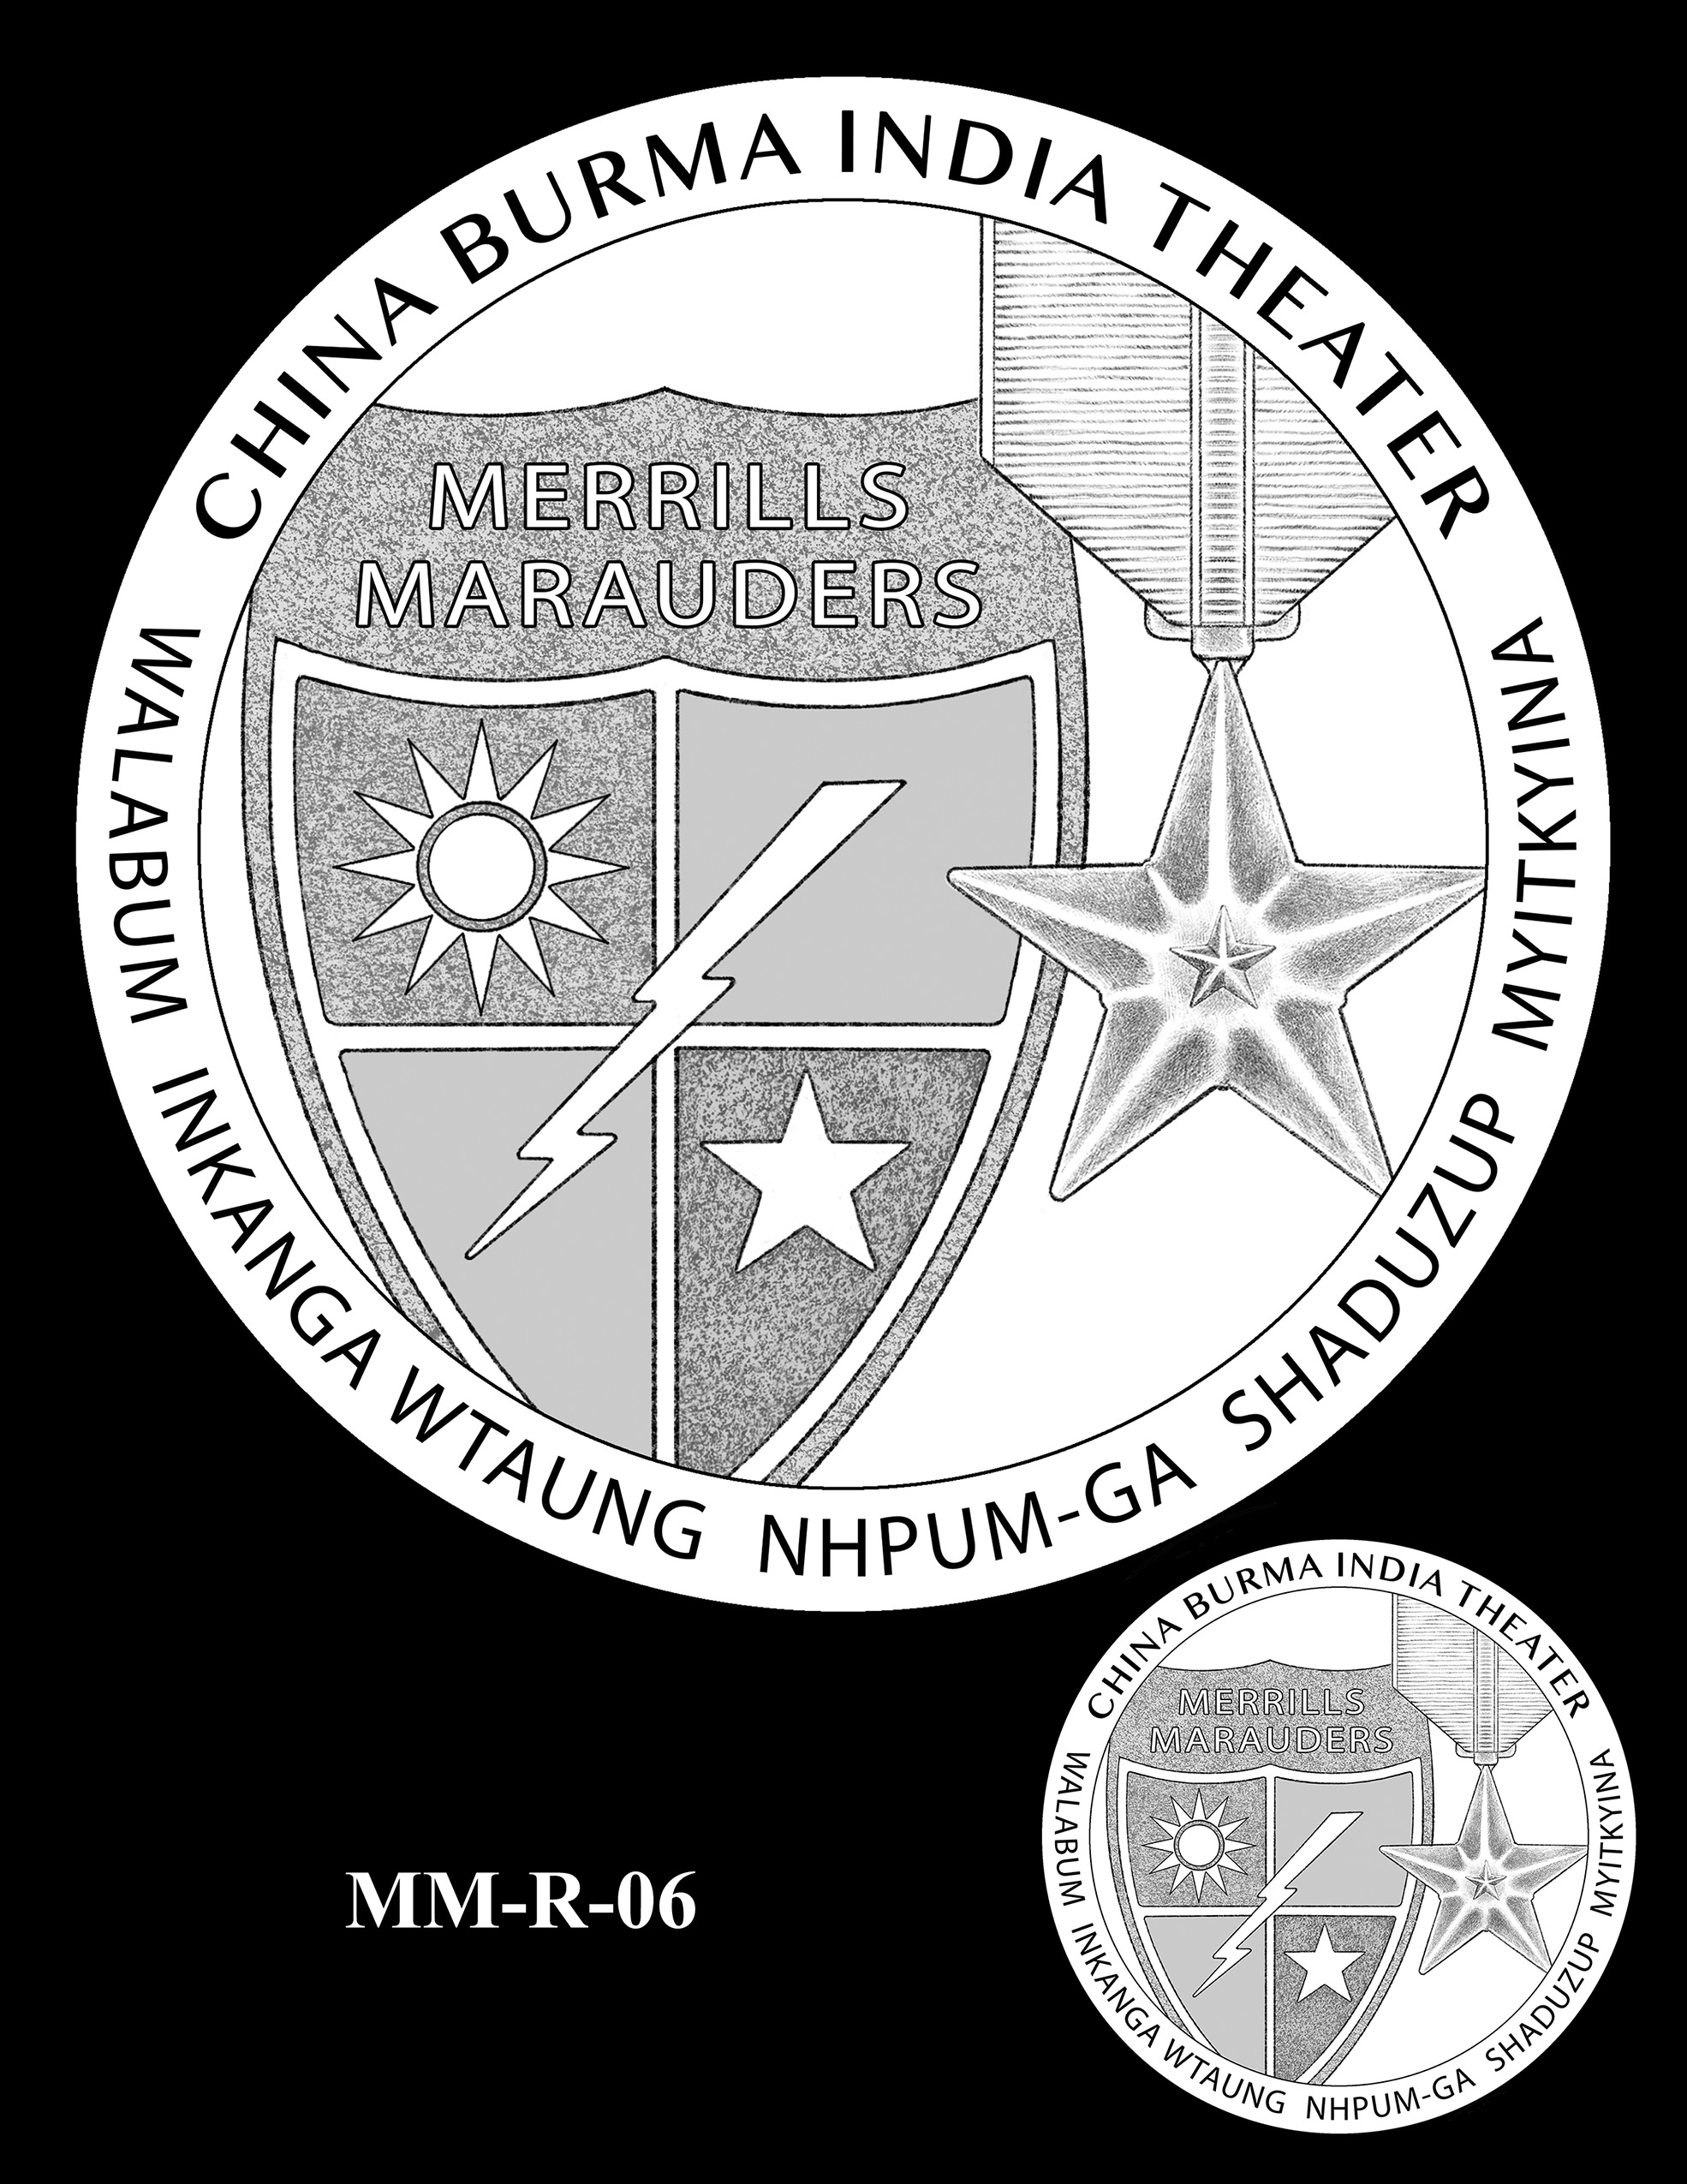 MM-R-06 -- Merrill's Marauders Congressional Gold Medal